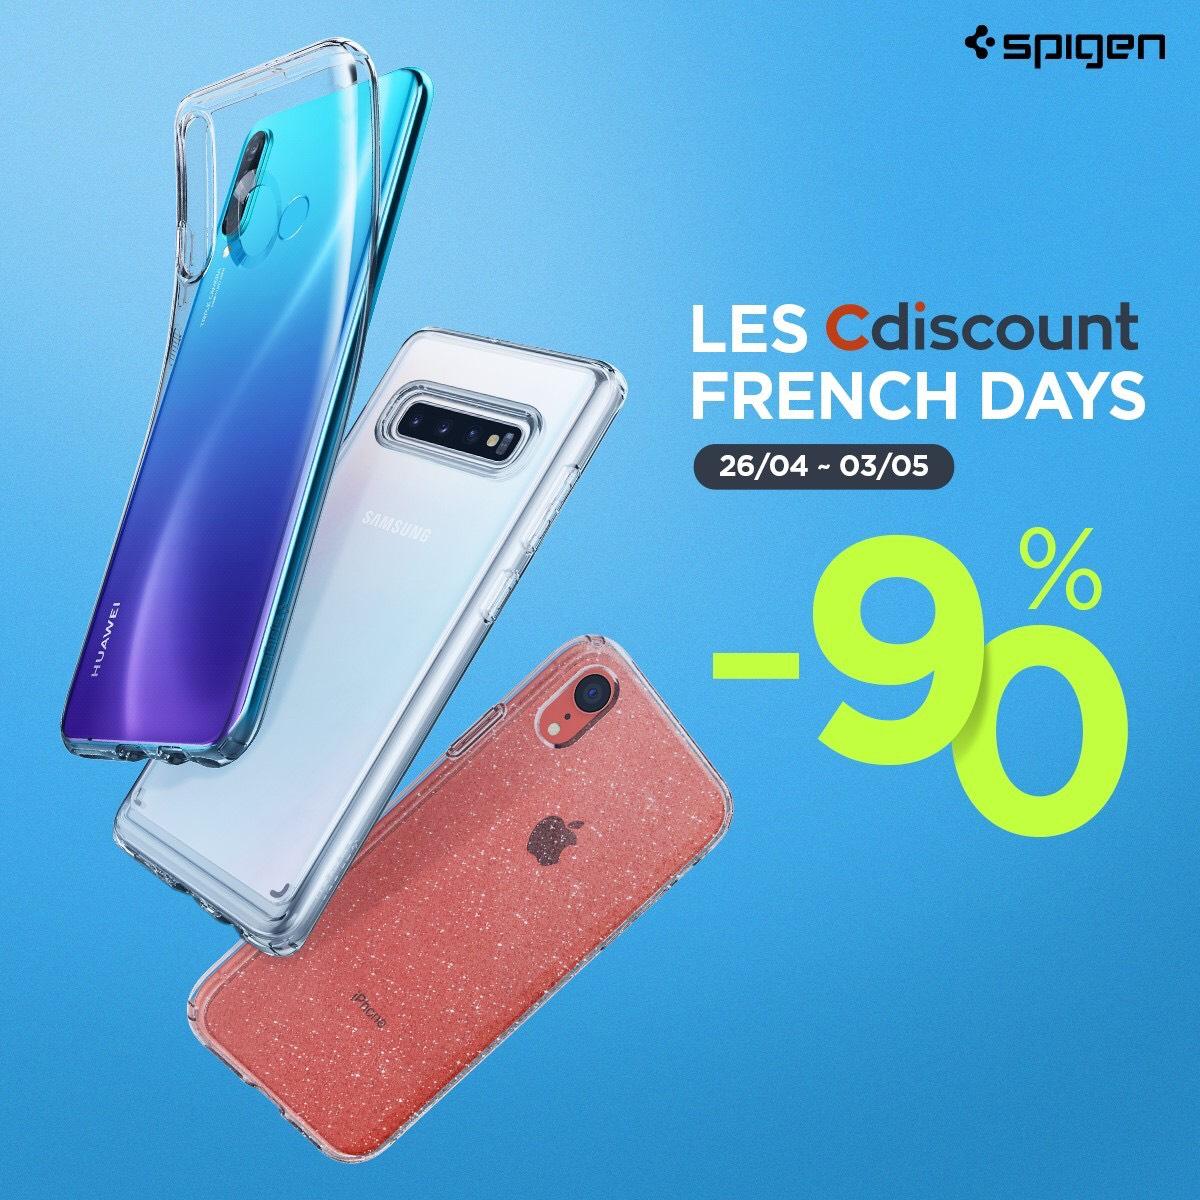 Sélection de coques Spigen en promotion - Ex : coque SPIGEN Liquid Air SAMSUNG Galaxy A8 2018